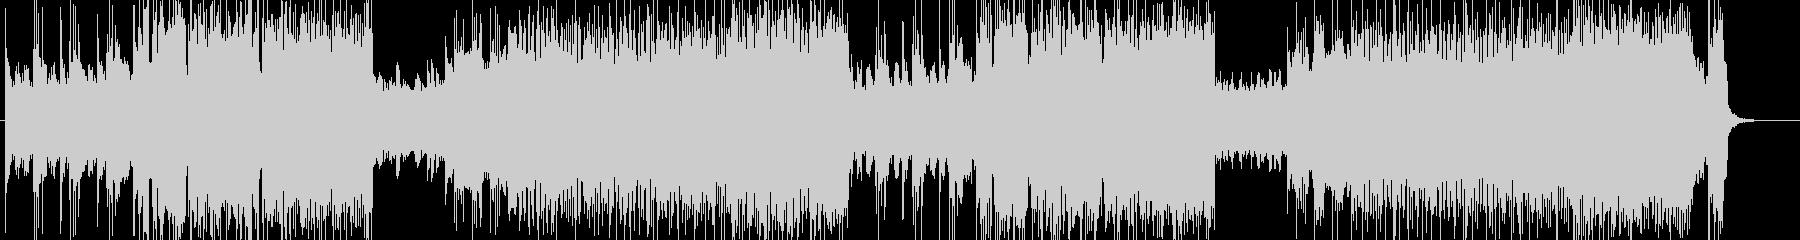 「HR/HM」「DEATH」BGM161の未再生の波形